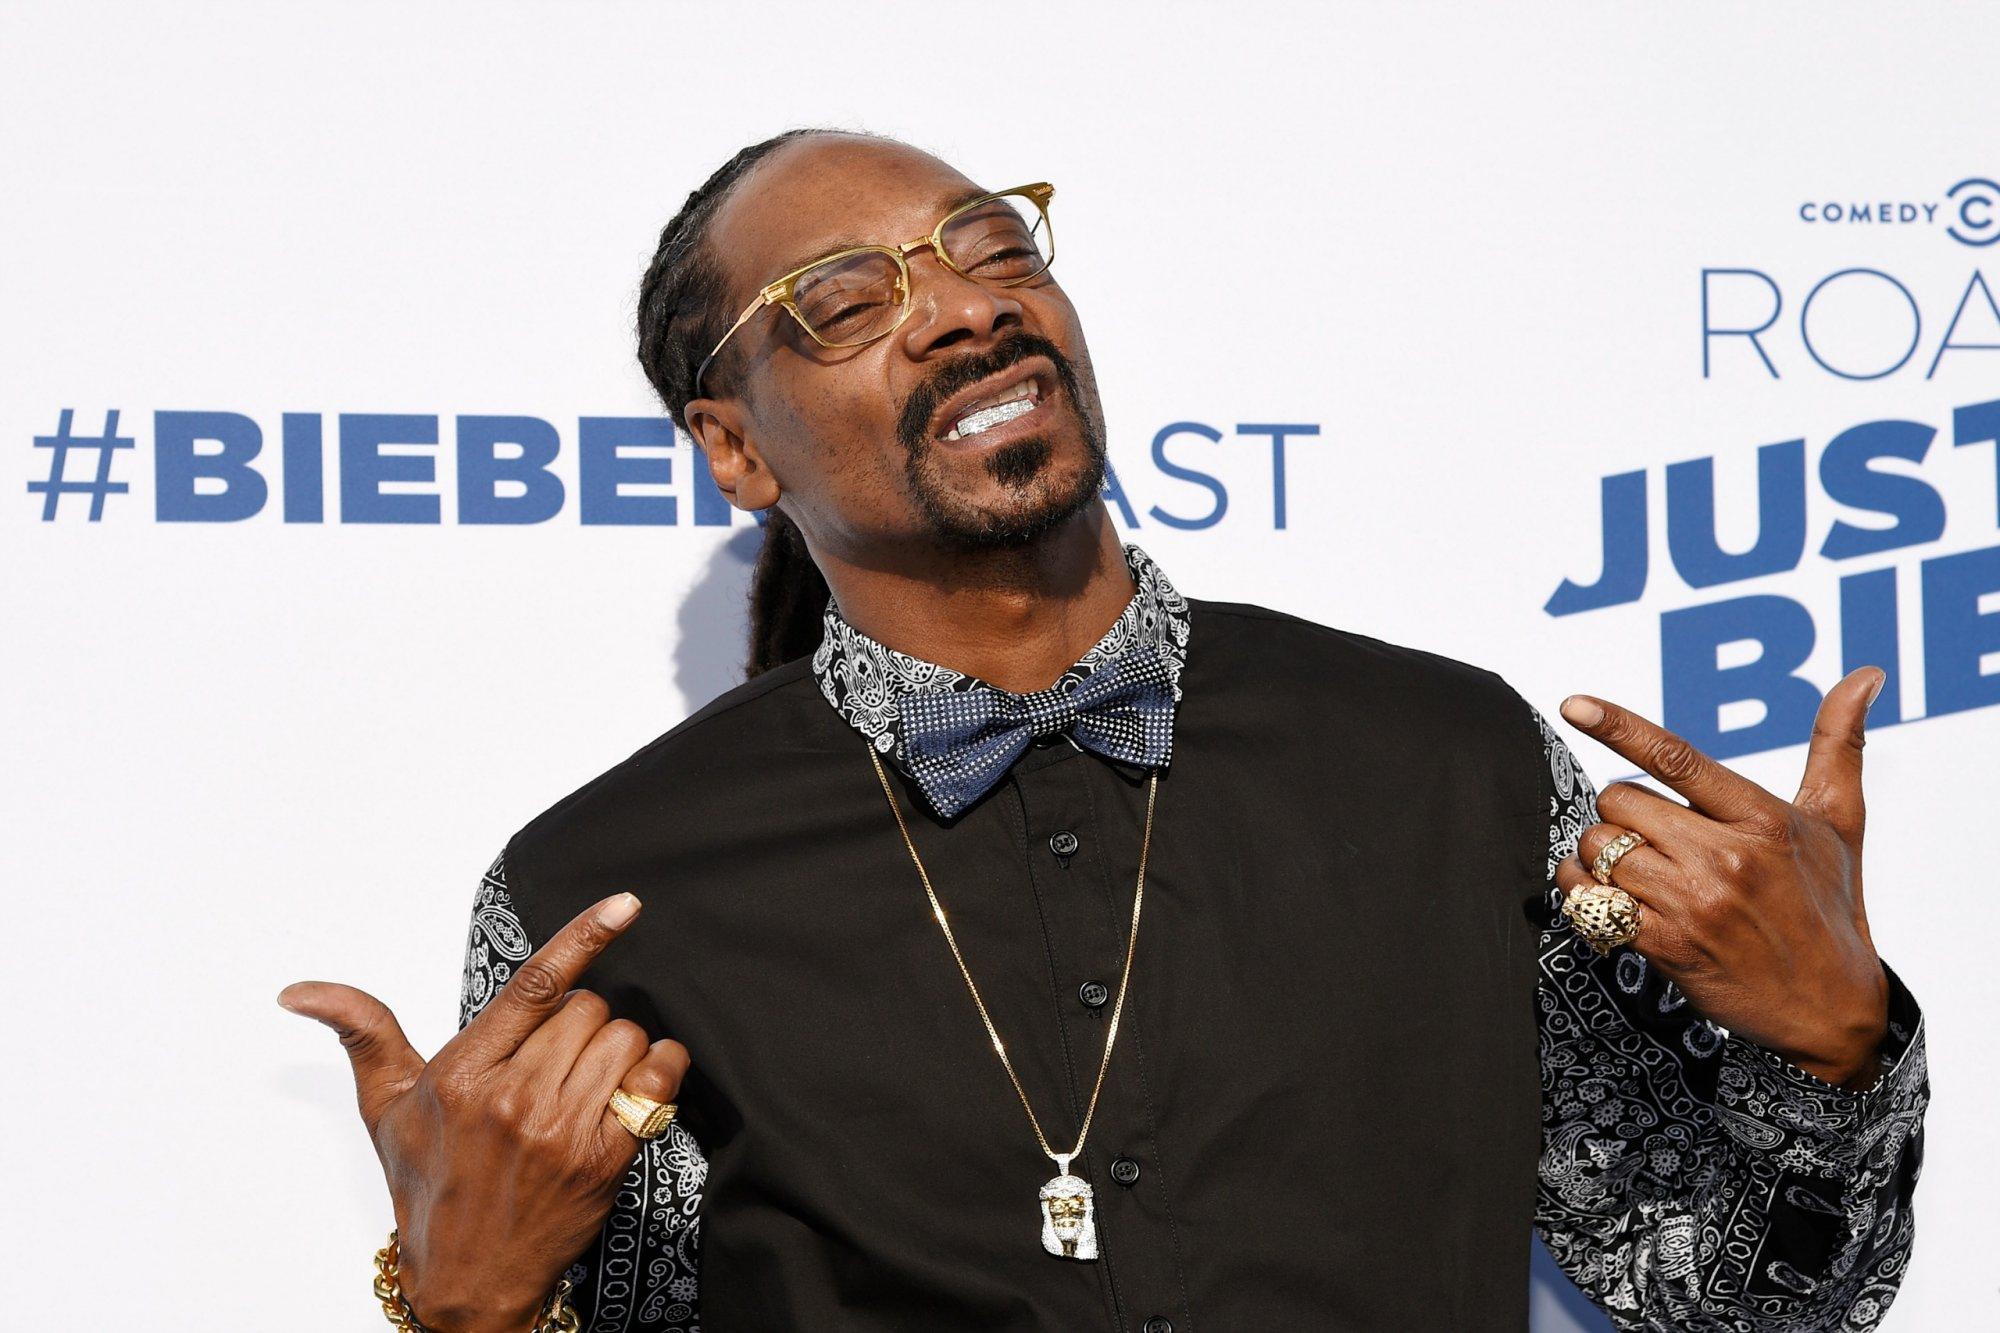 Snoop Dogg Wallpapers Hd